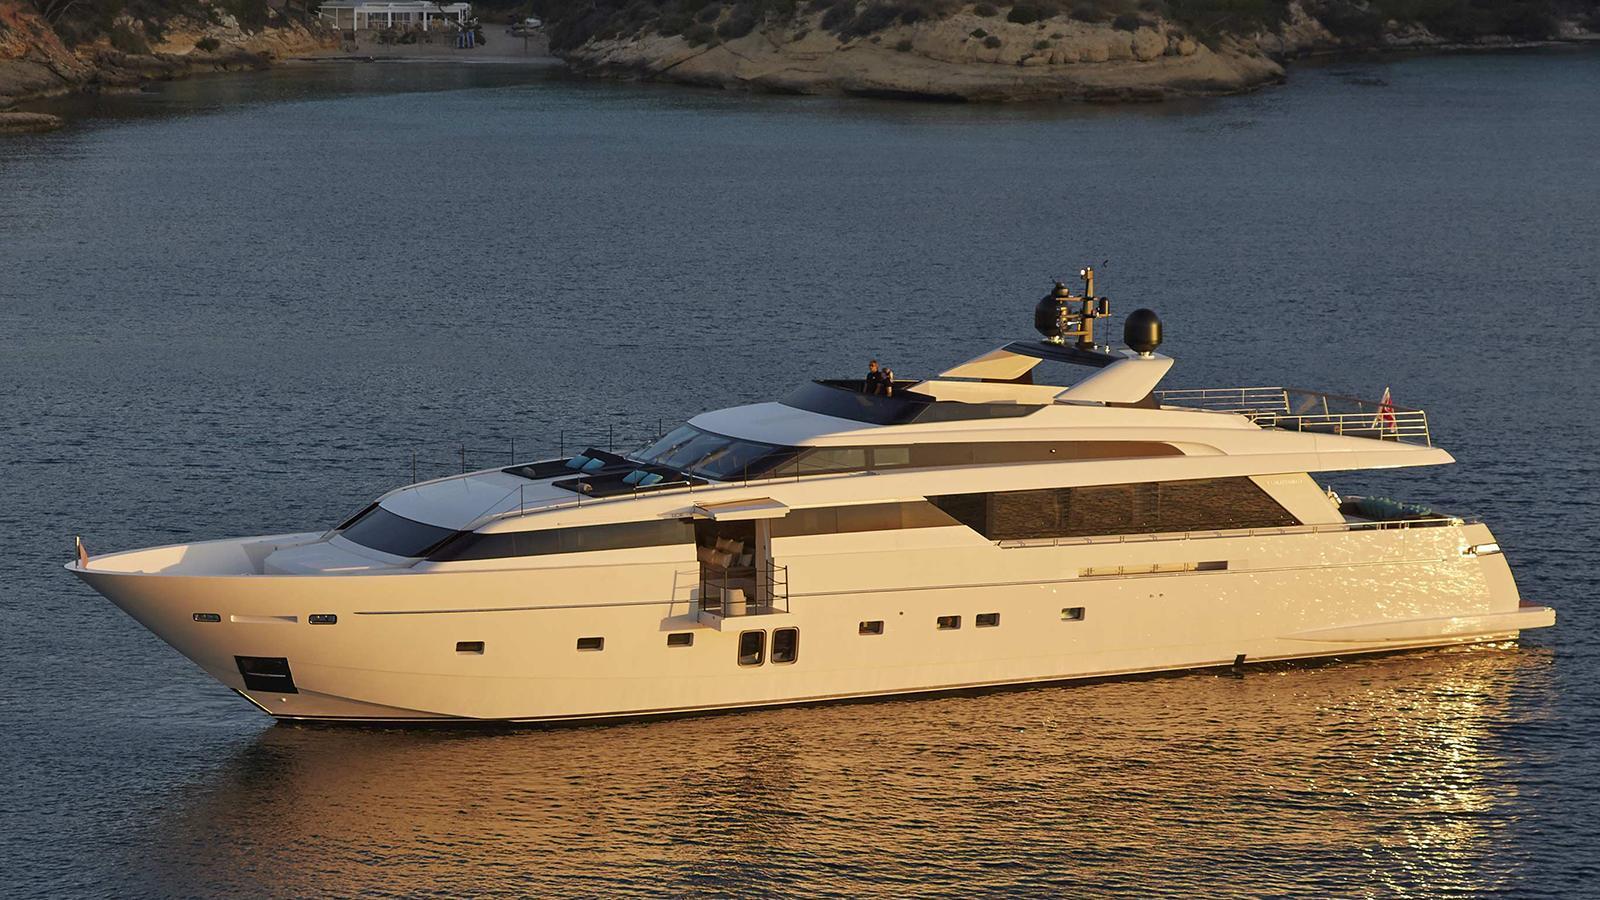 h1 motoryacht sanlorenzo sl118 36m 2014 half profile